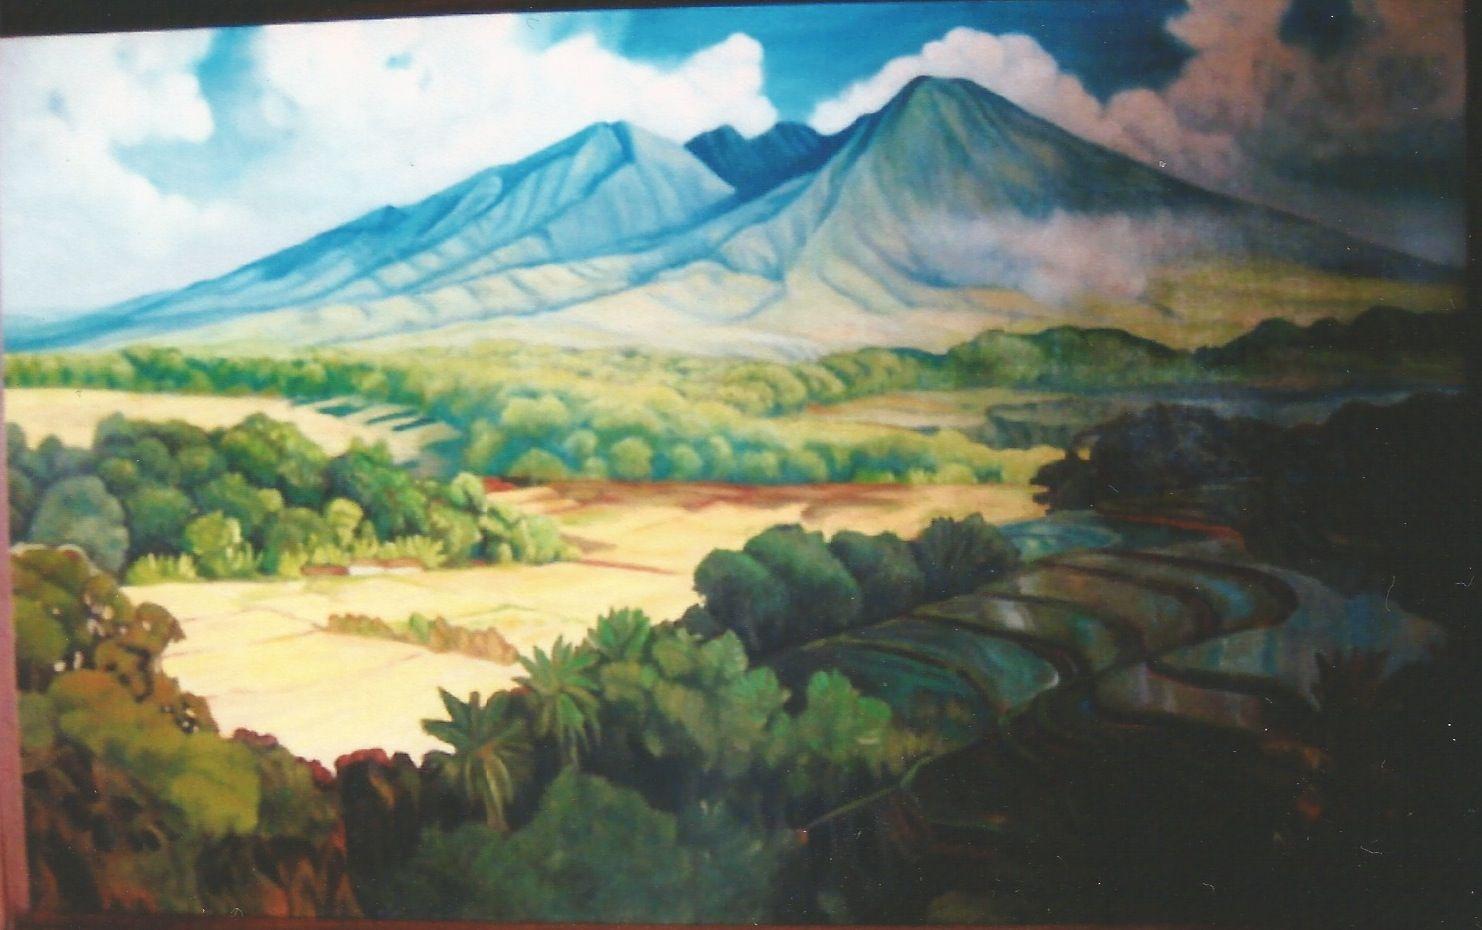 Basuki Abdullah The Landscape Pemandangan Seni Perjalanan